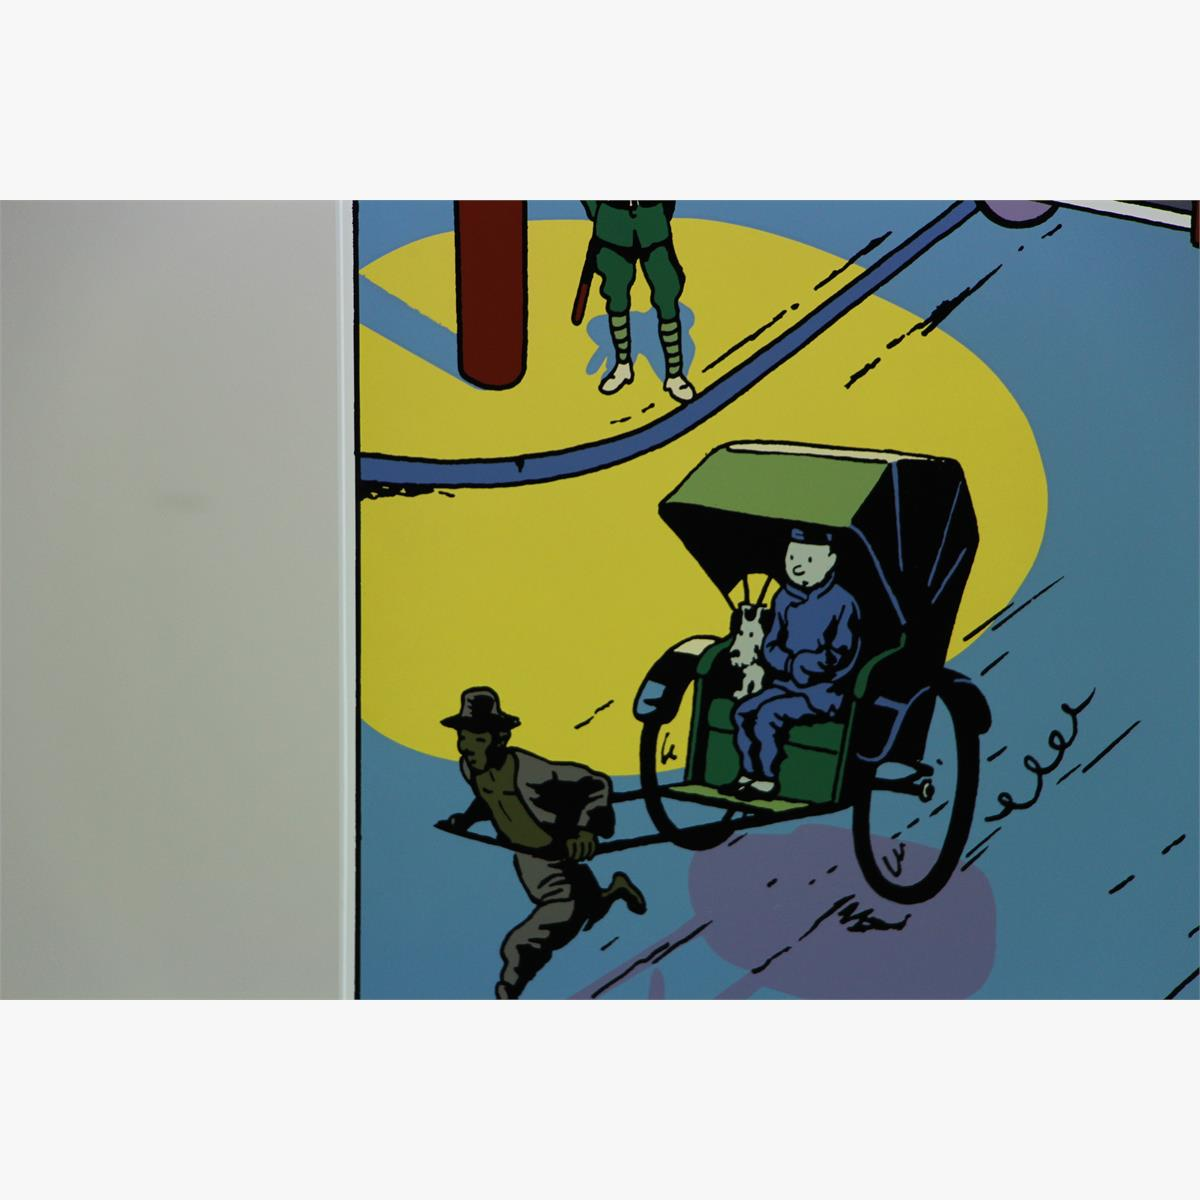 Afbeeldingen van emaille bord kuifje de blauwe lotus uit de blauwe lotus (kuifje in de straten van shanghai) plaque emaillee tintin 1992 tirage 71 ex le lotus blue ''tintin dans les rues de shangaï''